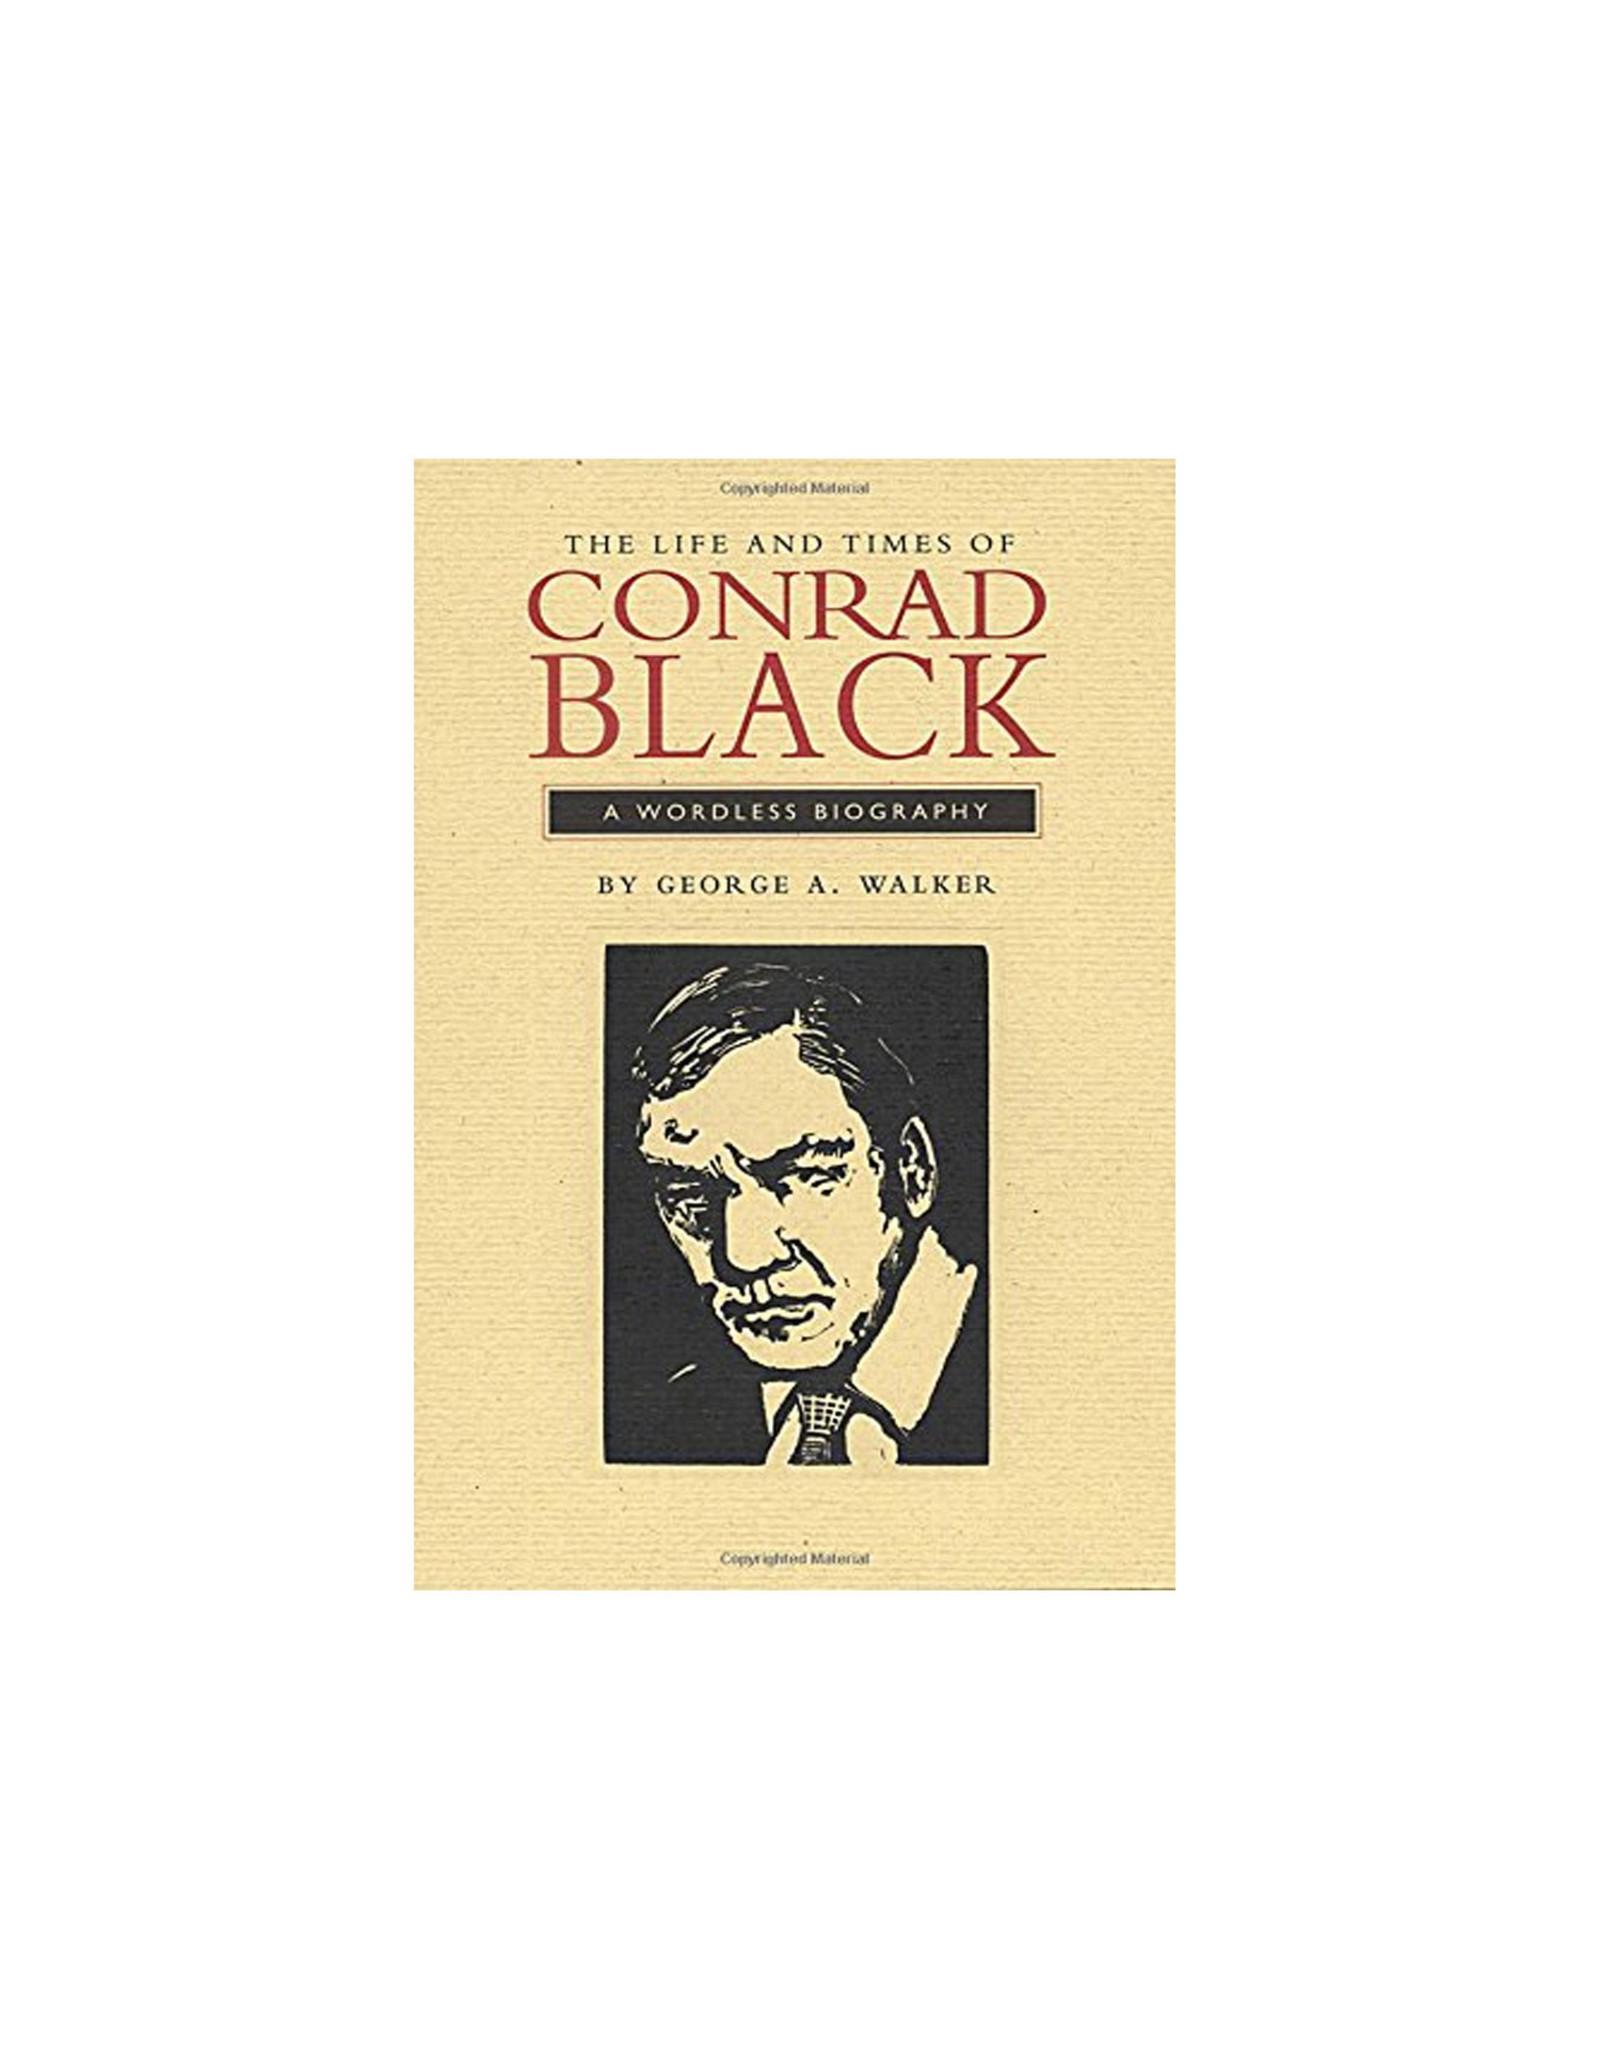 Conrad Black: A Wordless Biography